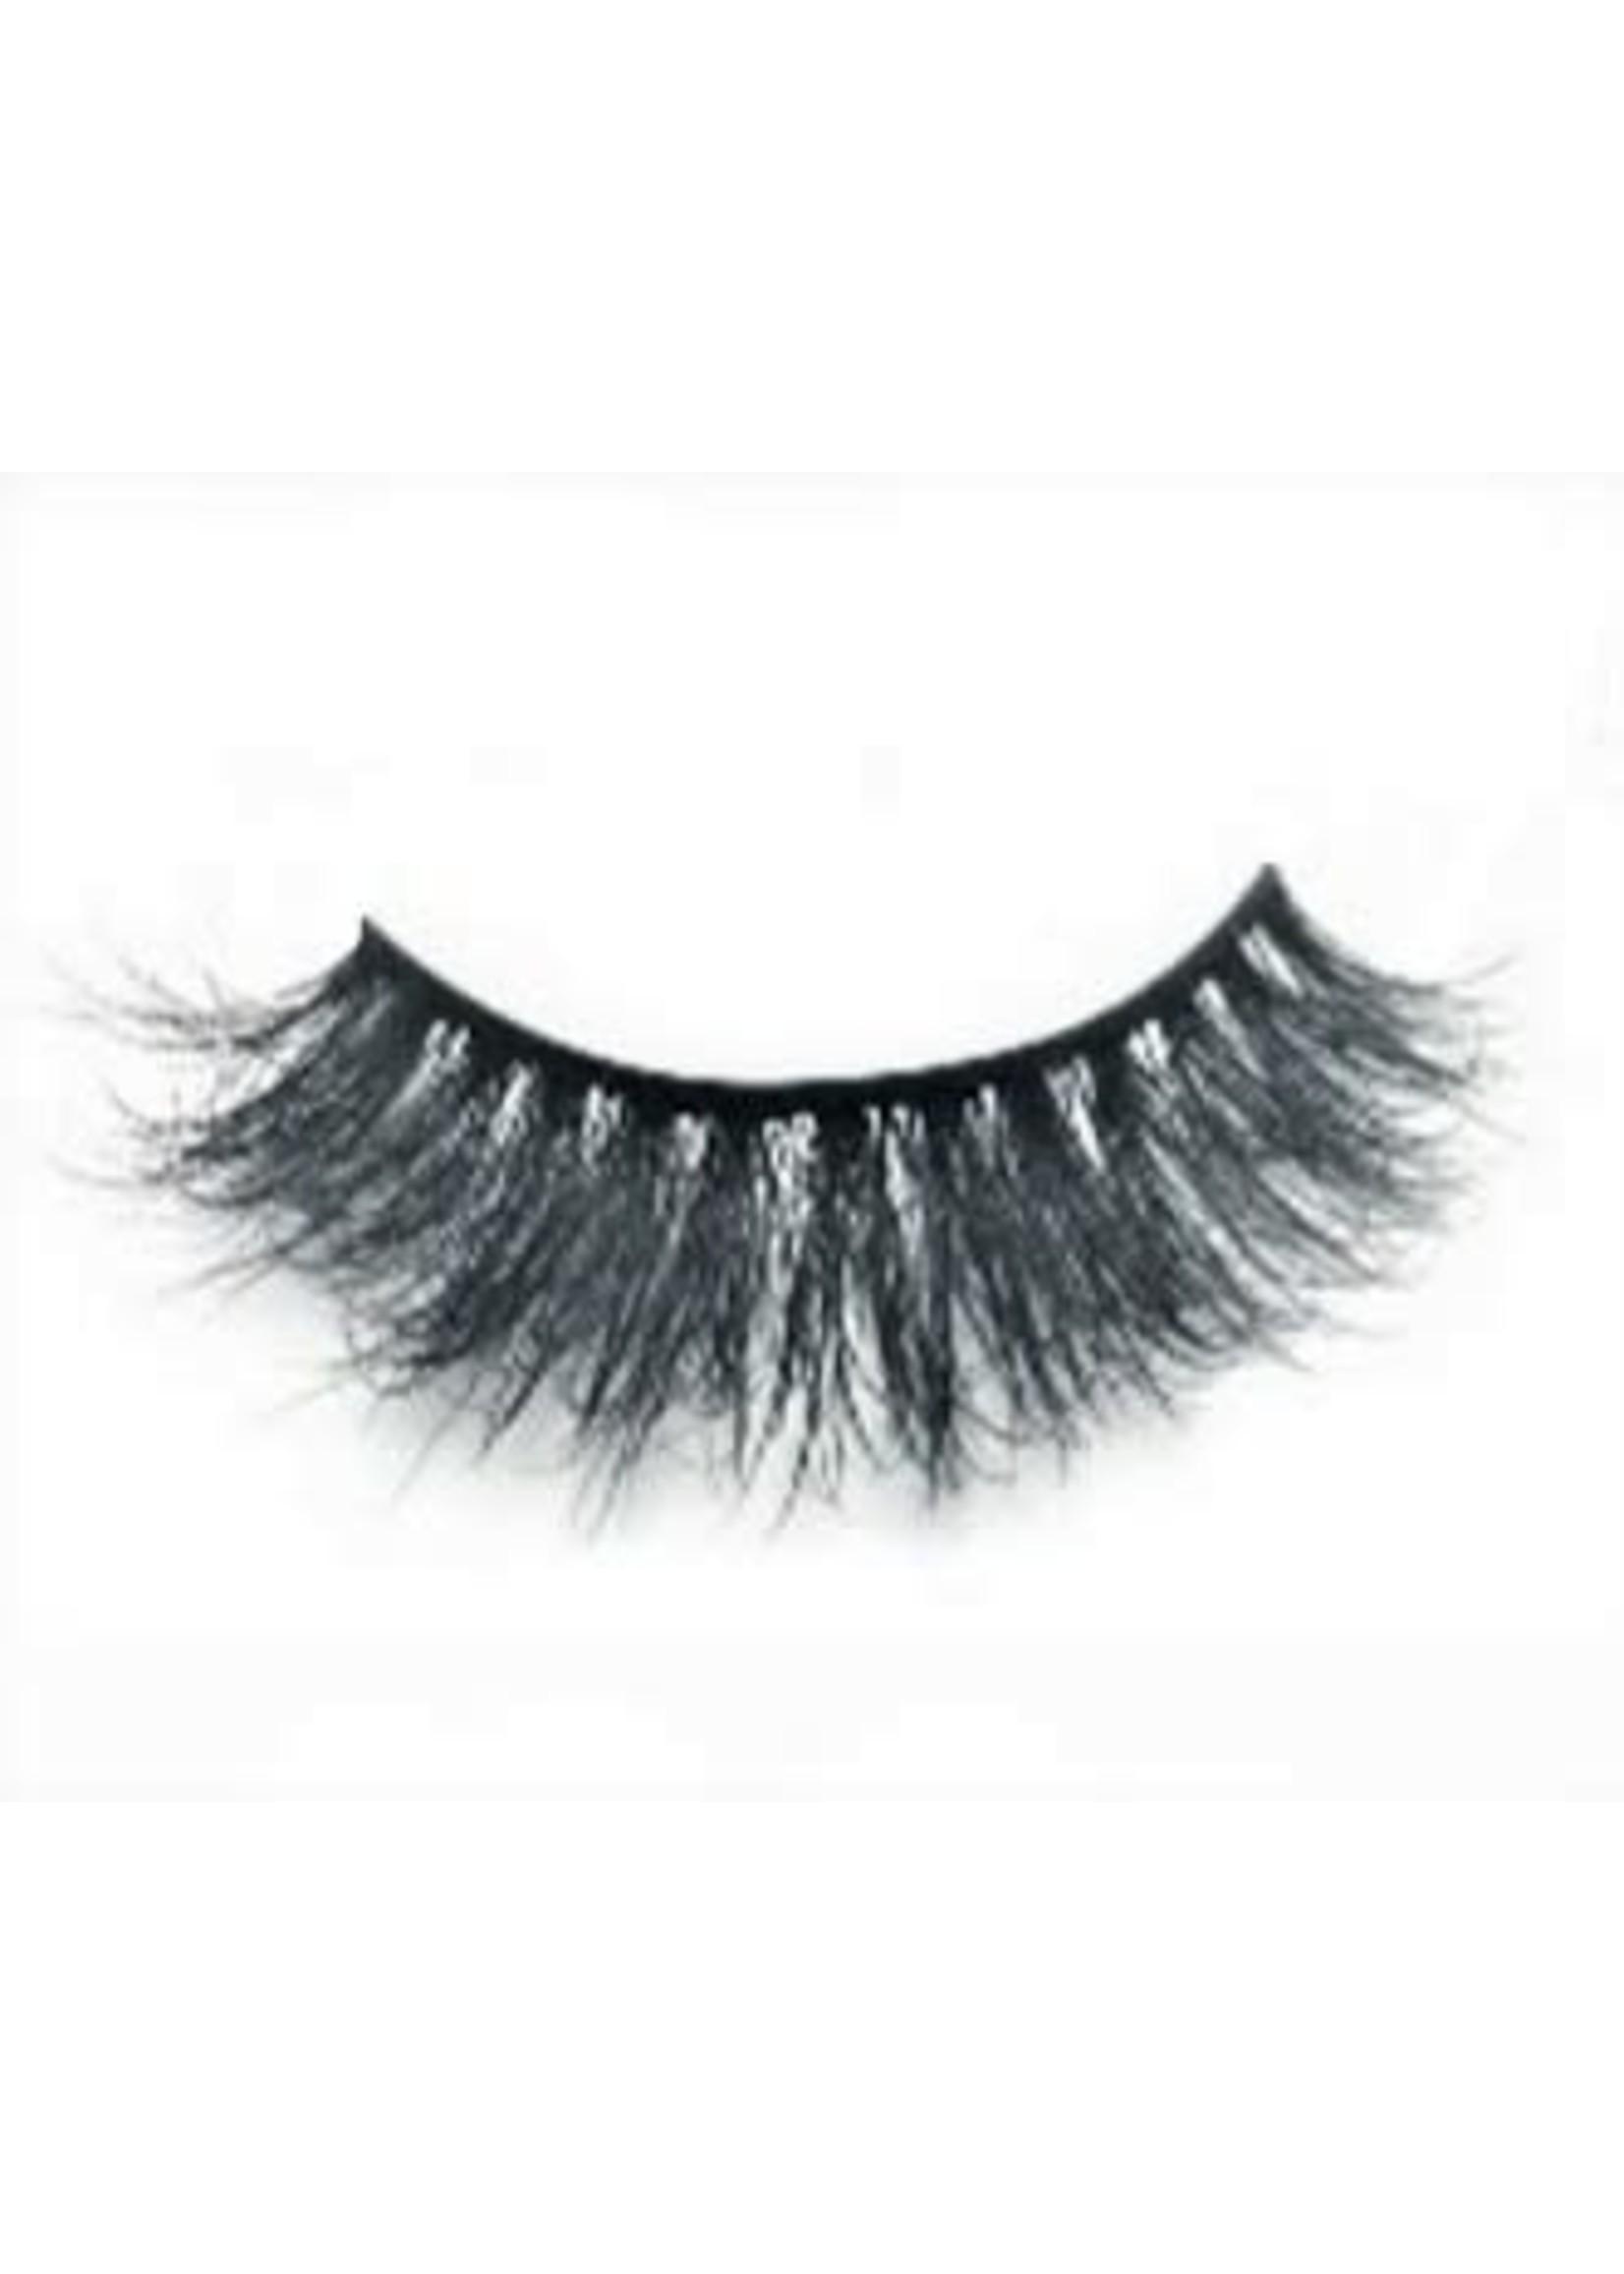 Mink Magnetic Eyelashes Delicate